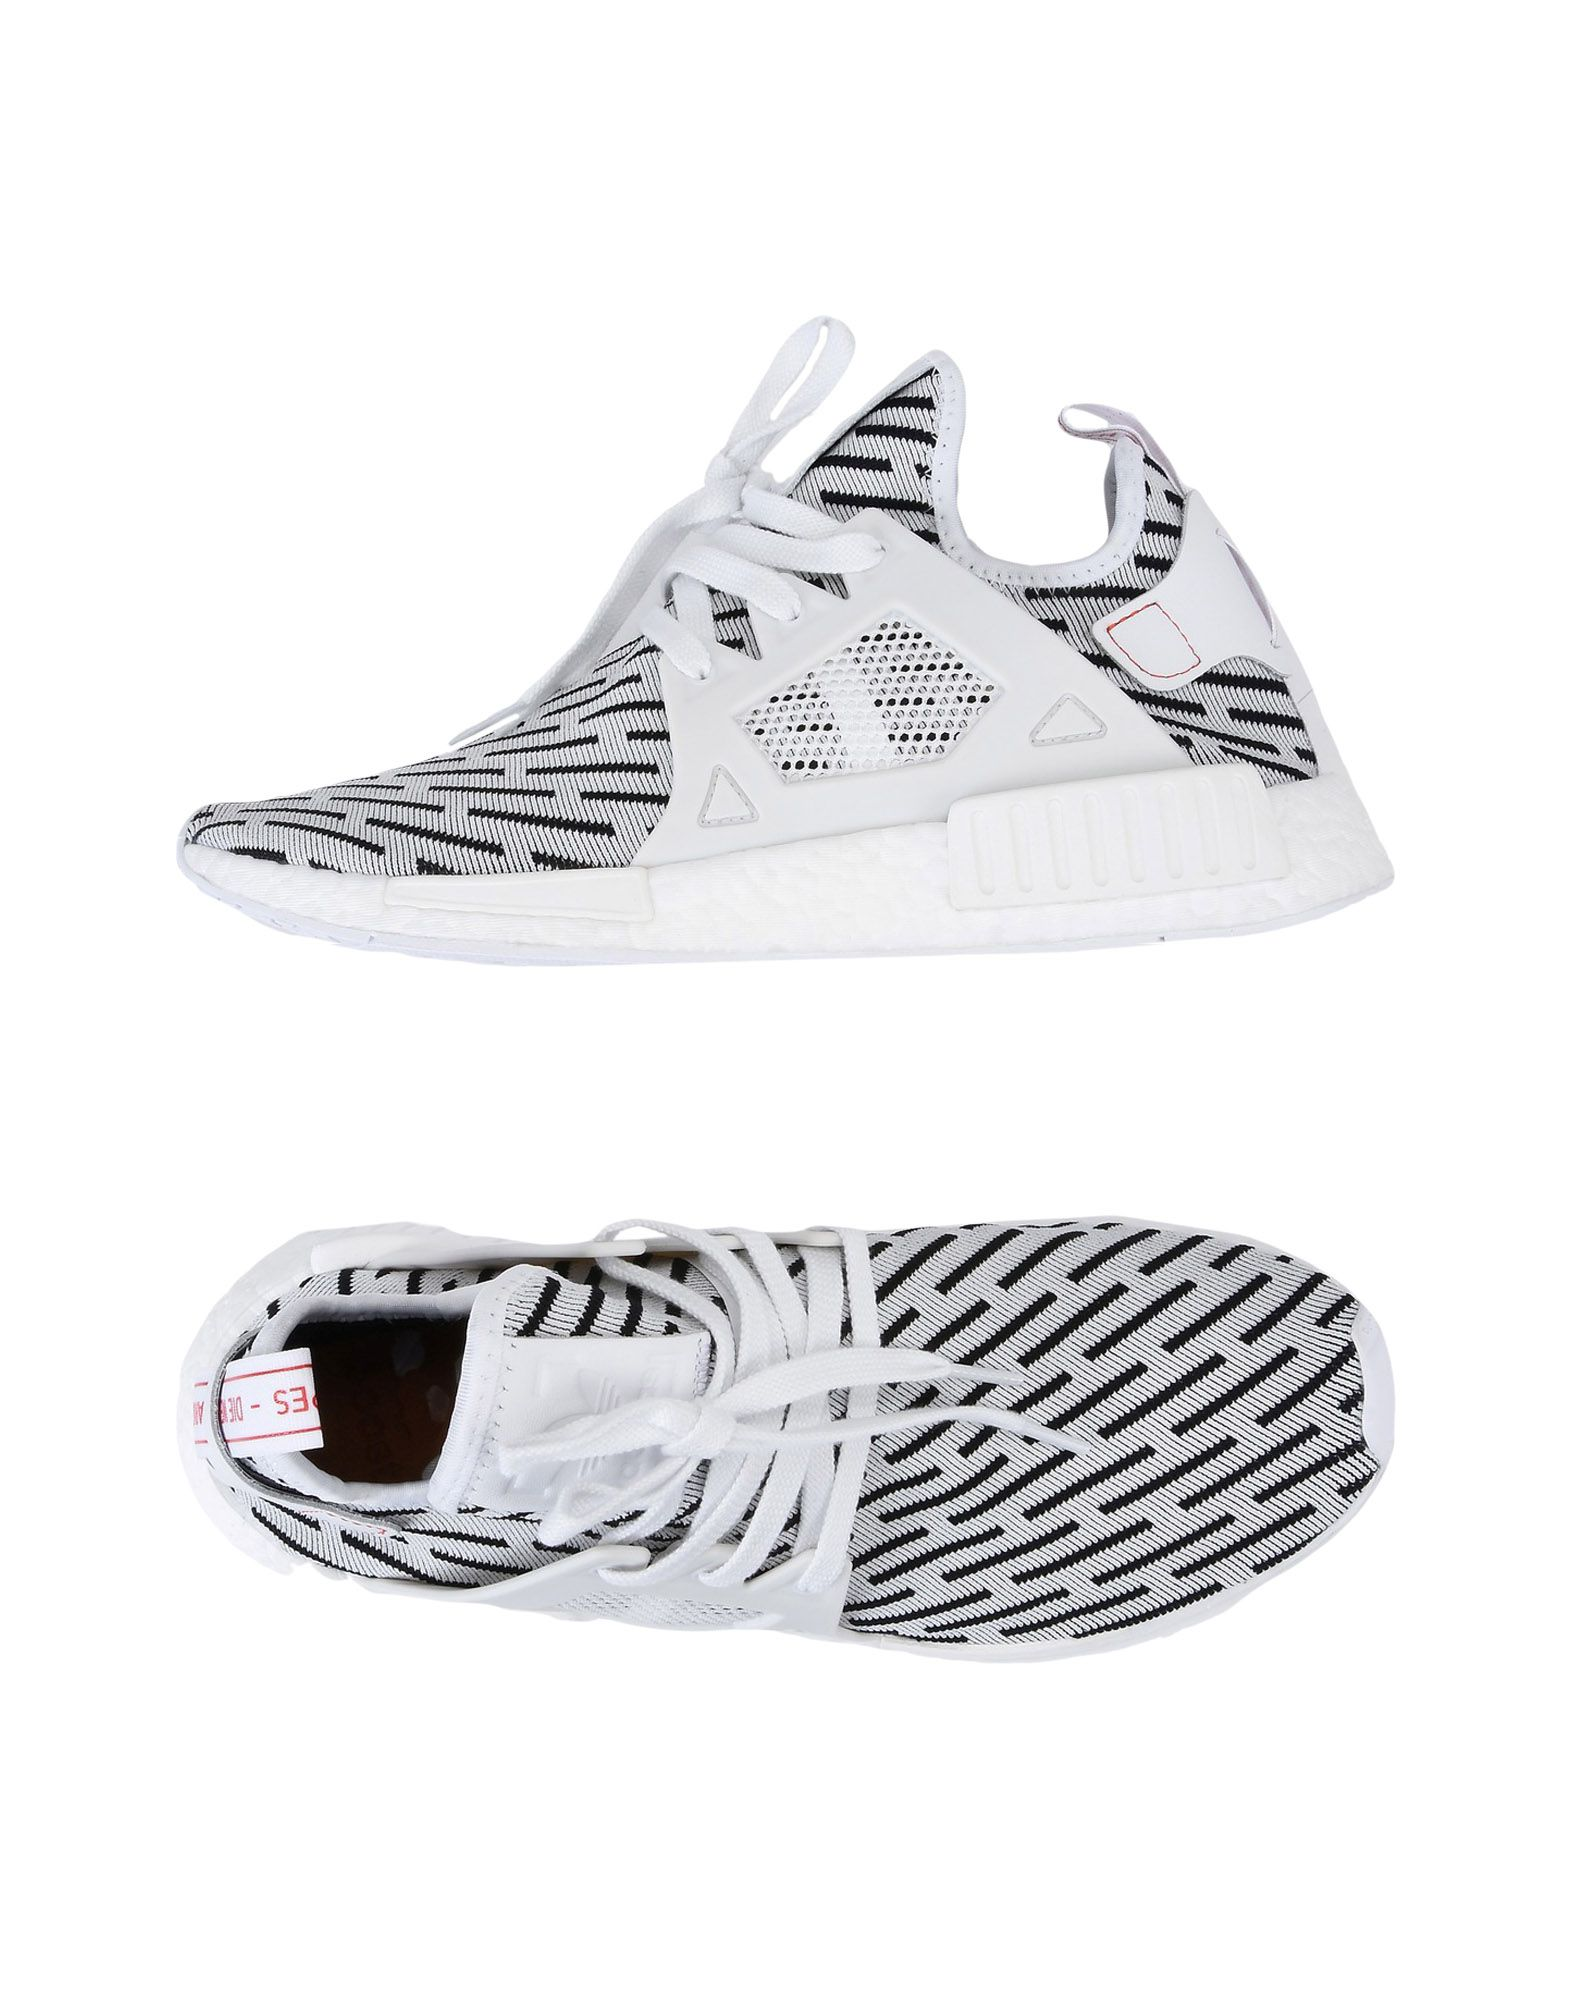 Sneakers Adidas Originals Nmd_Xr1 Pk - Uomo - 11269934LX